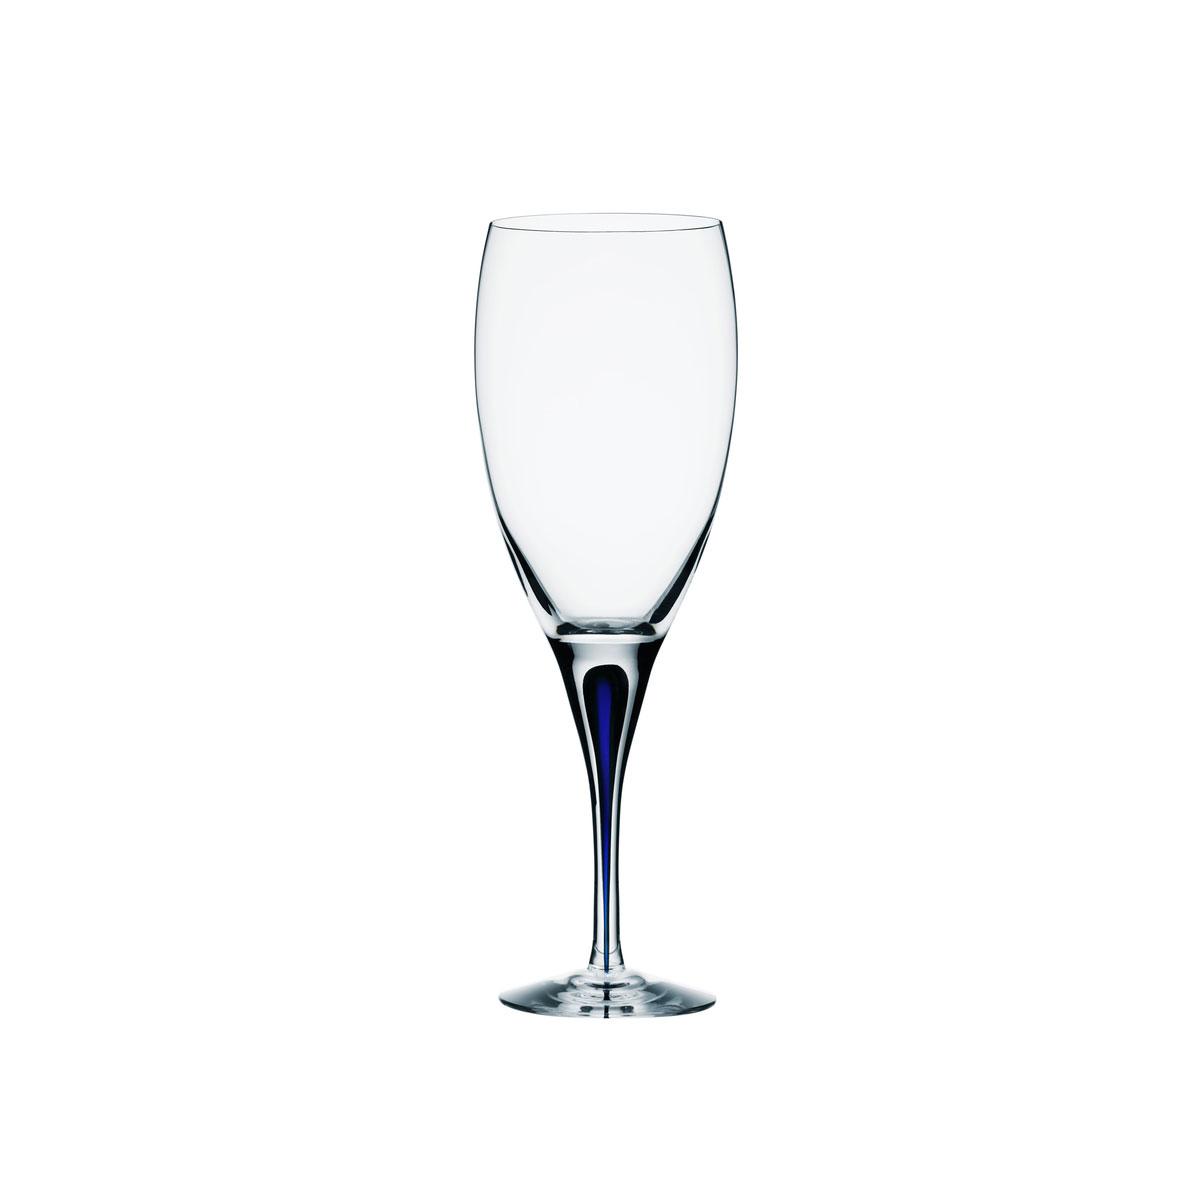 Orrefors Crystal, Intermezzo Blue White Wine, Single